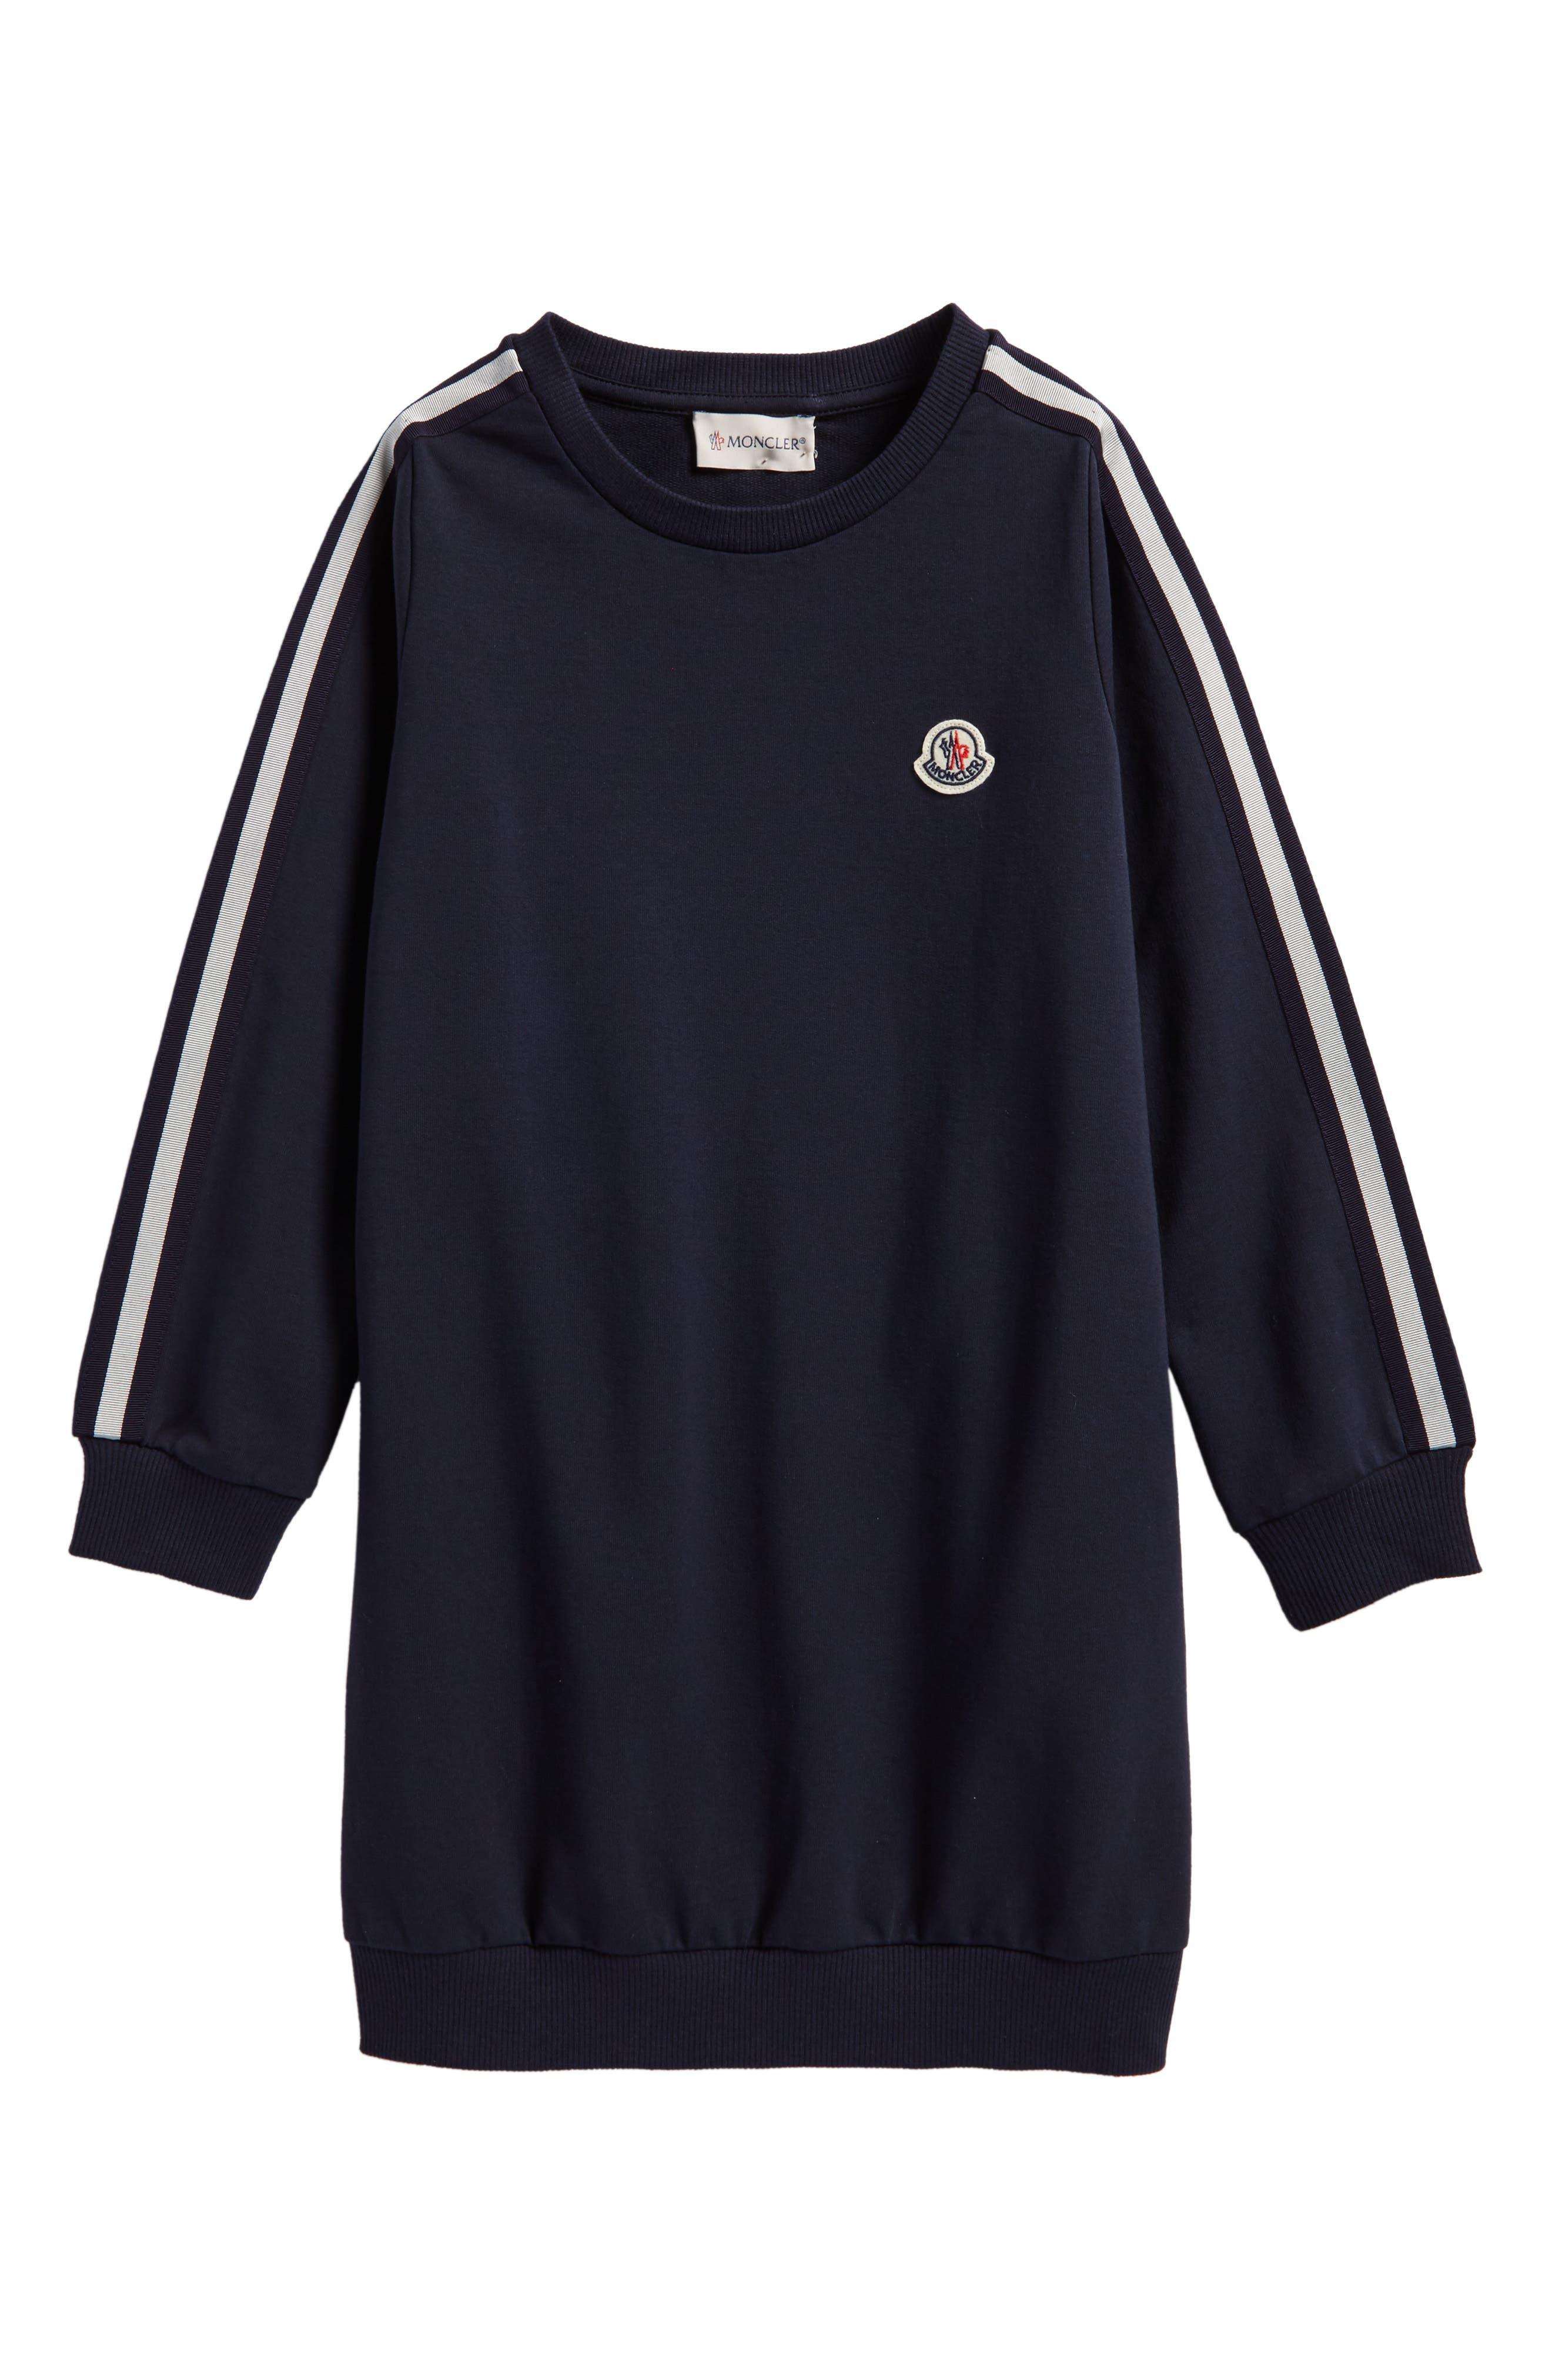 Alternate Image 1 Selected - Moncler Sweatshirt Dress (Little Girls & Big Girls)